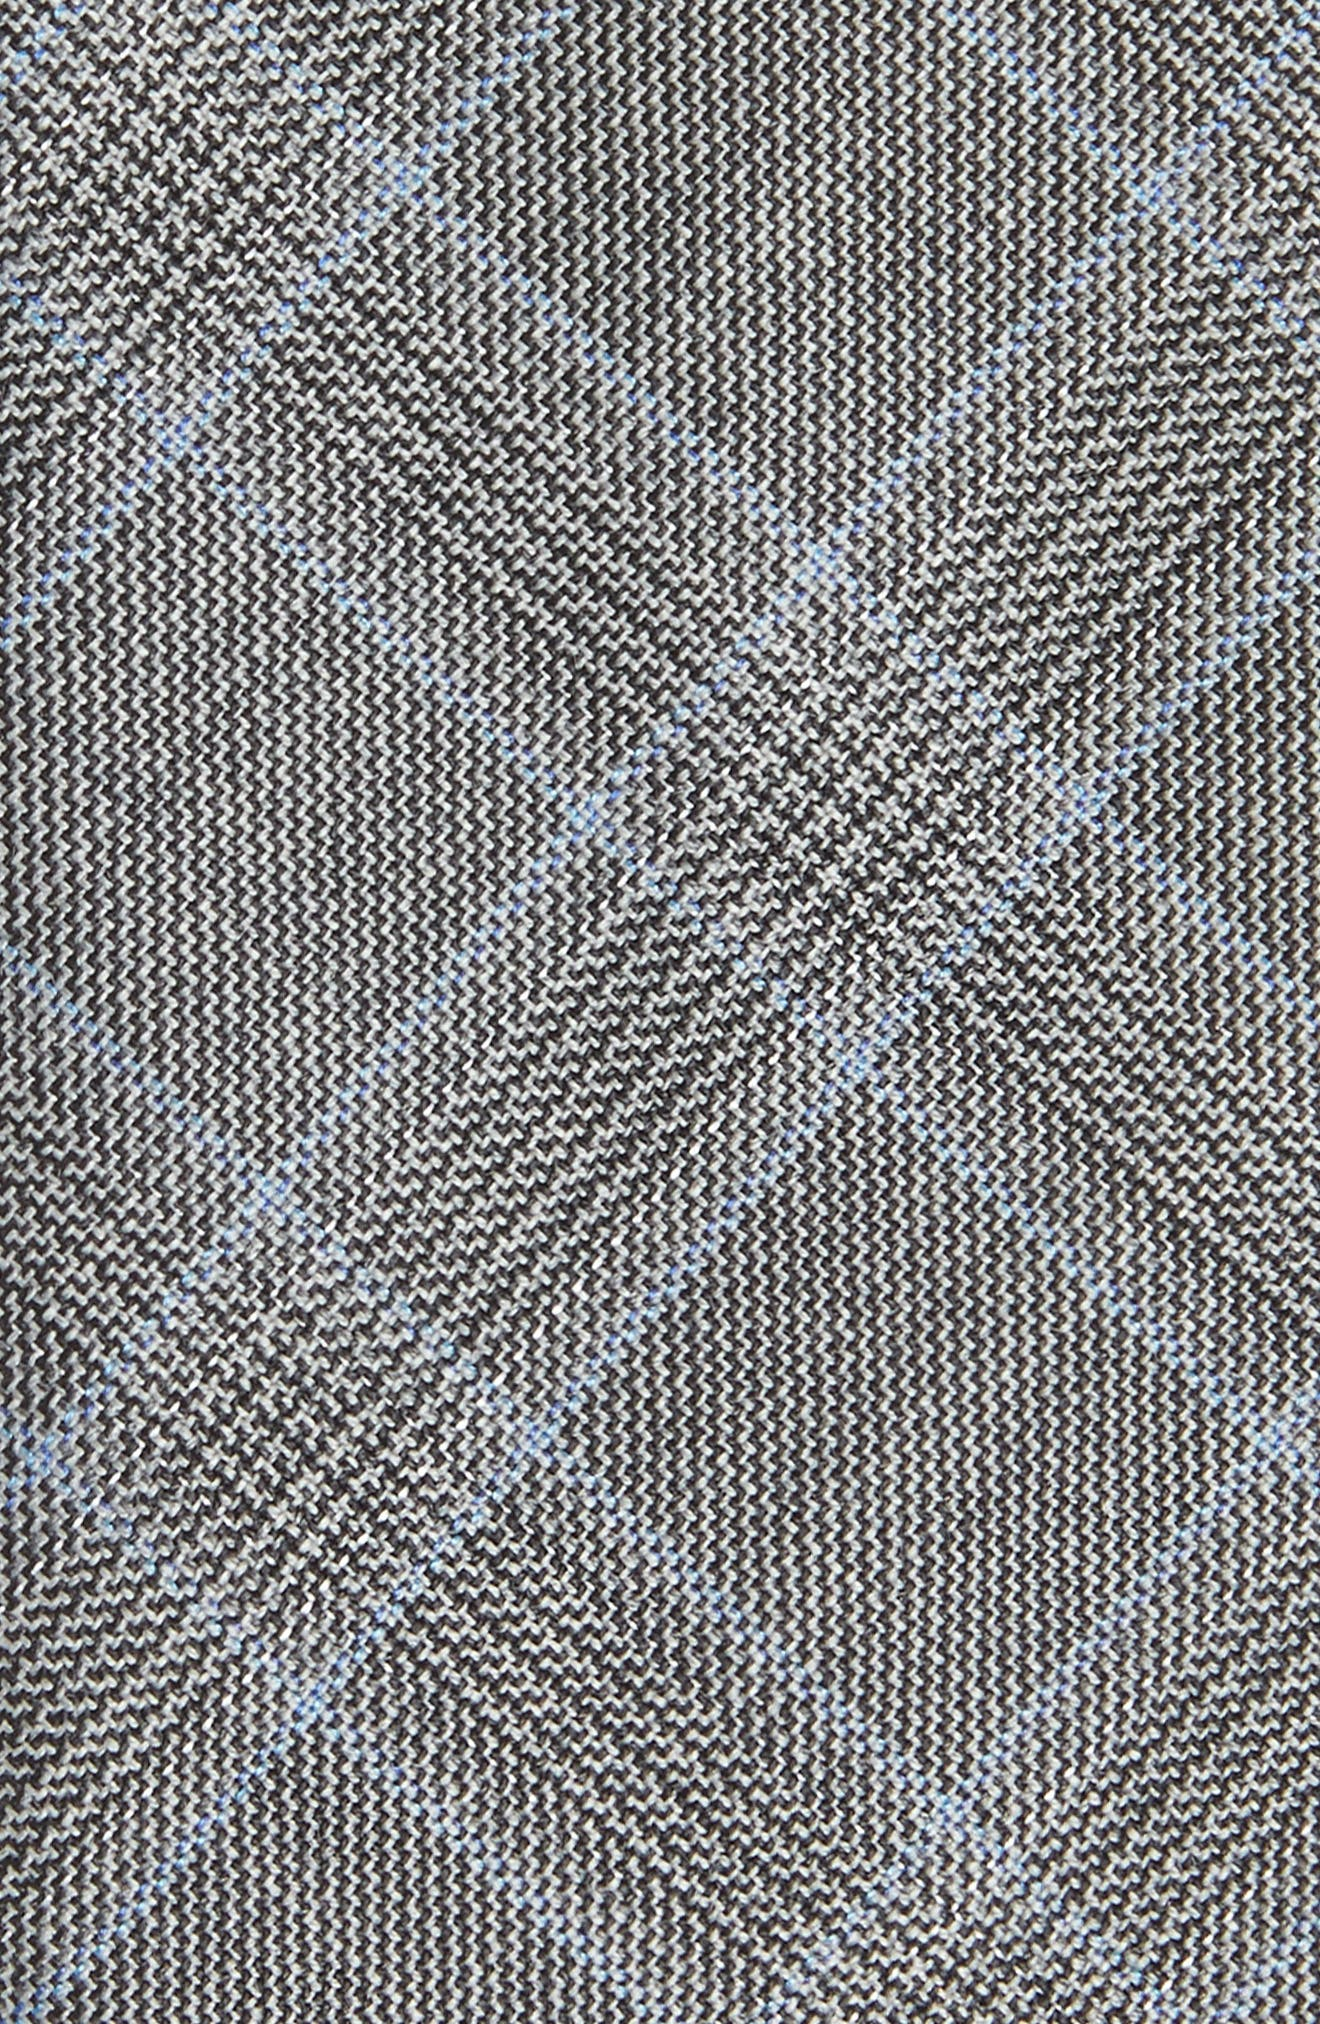 Plaid Wool Tie,                             Alternate thumbnail 2, color,                             Open Grey